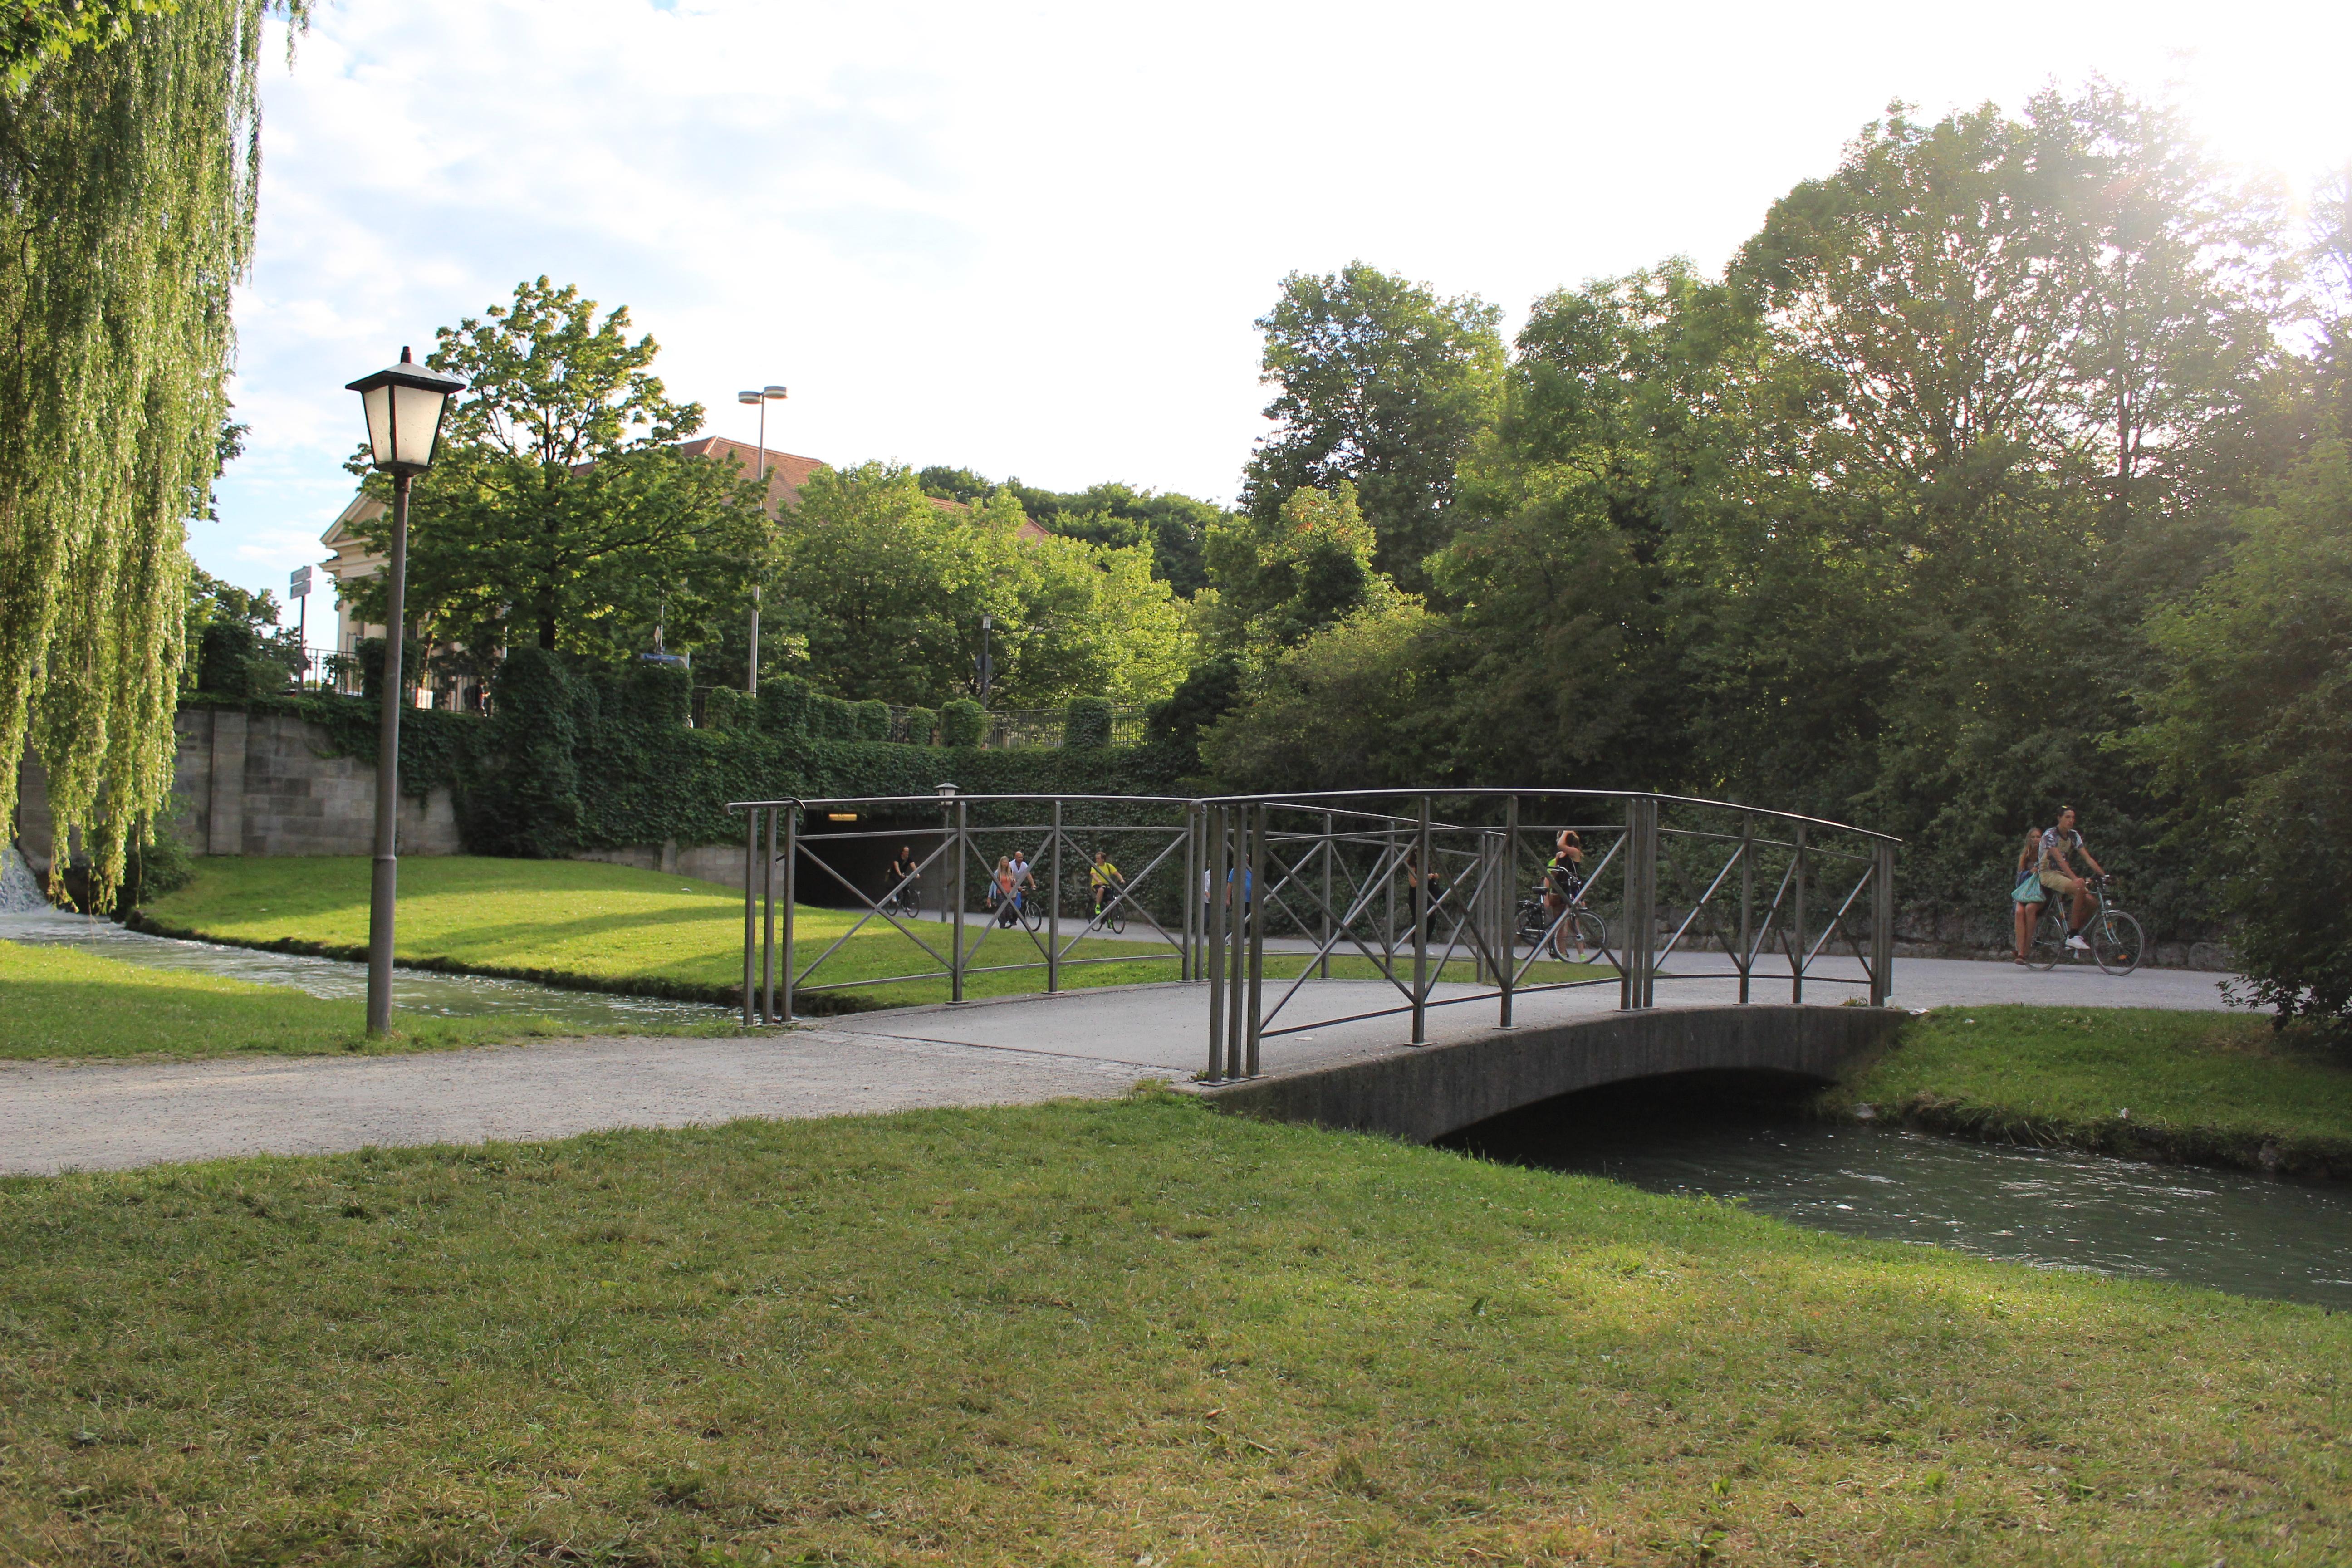 The walking bridge, Bridge, Garden, Green, Lake, HQ Photo